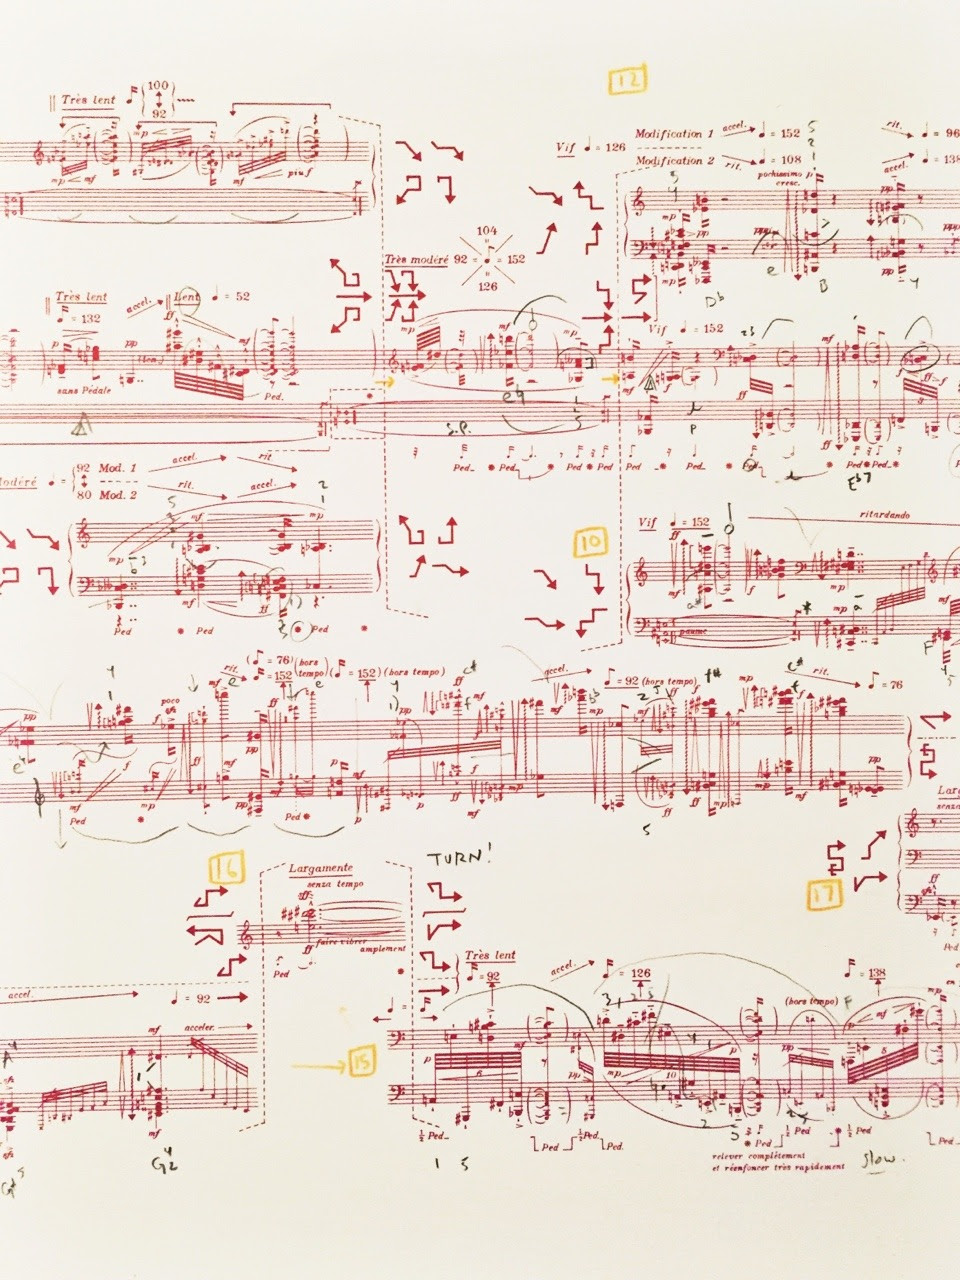 Sonata no. 3, Constellation-Miroir.  by Pierre Boulez